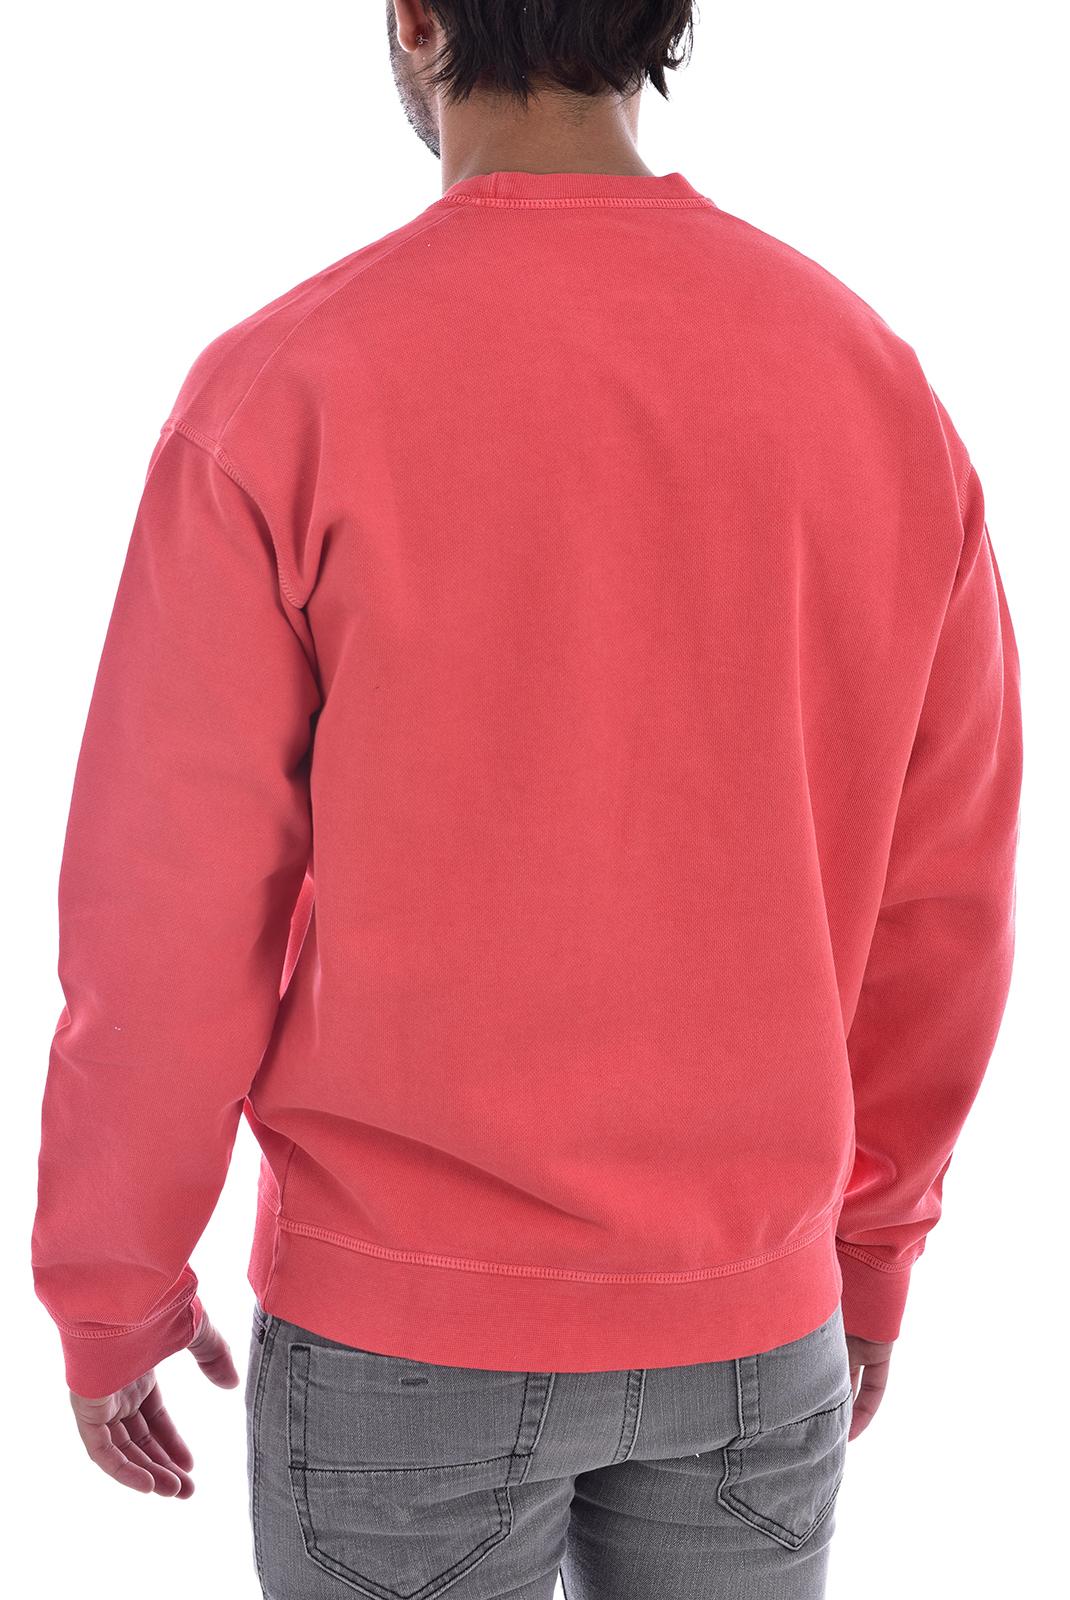 Sweatshirts  Dsquared2 S74GU0108 304 ROUGE